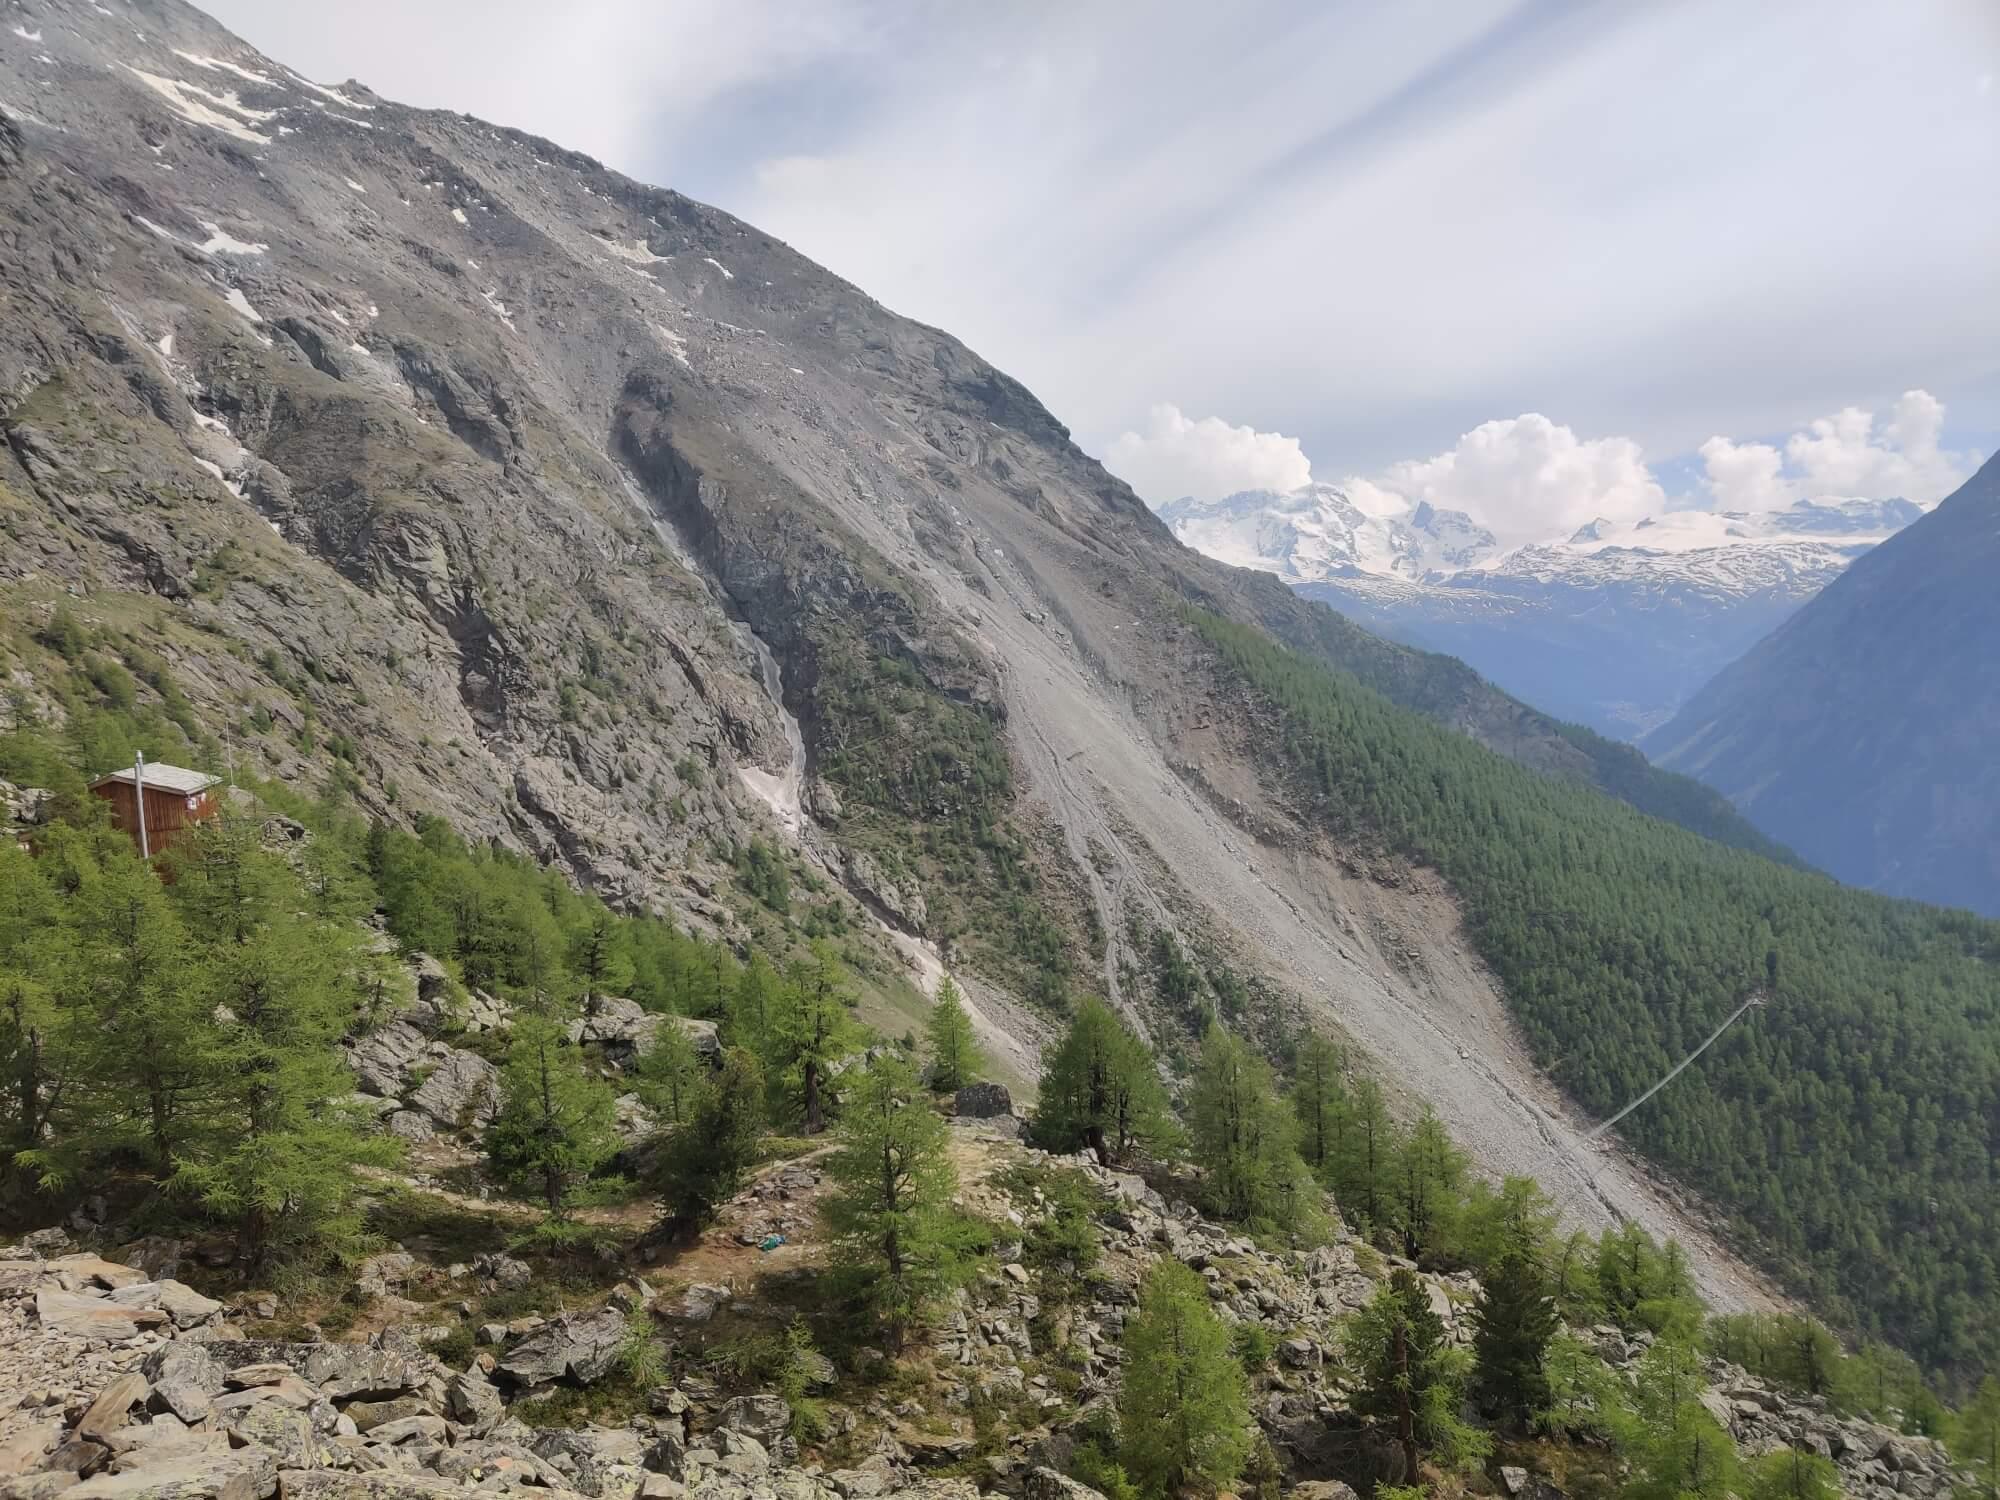 Europahütte and the Suspension Bridge:  Open for the 2019 season